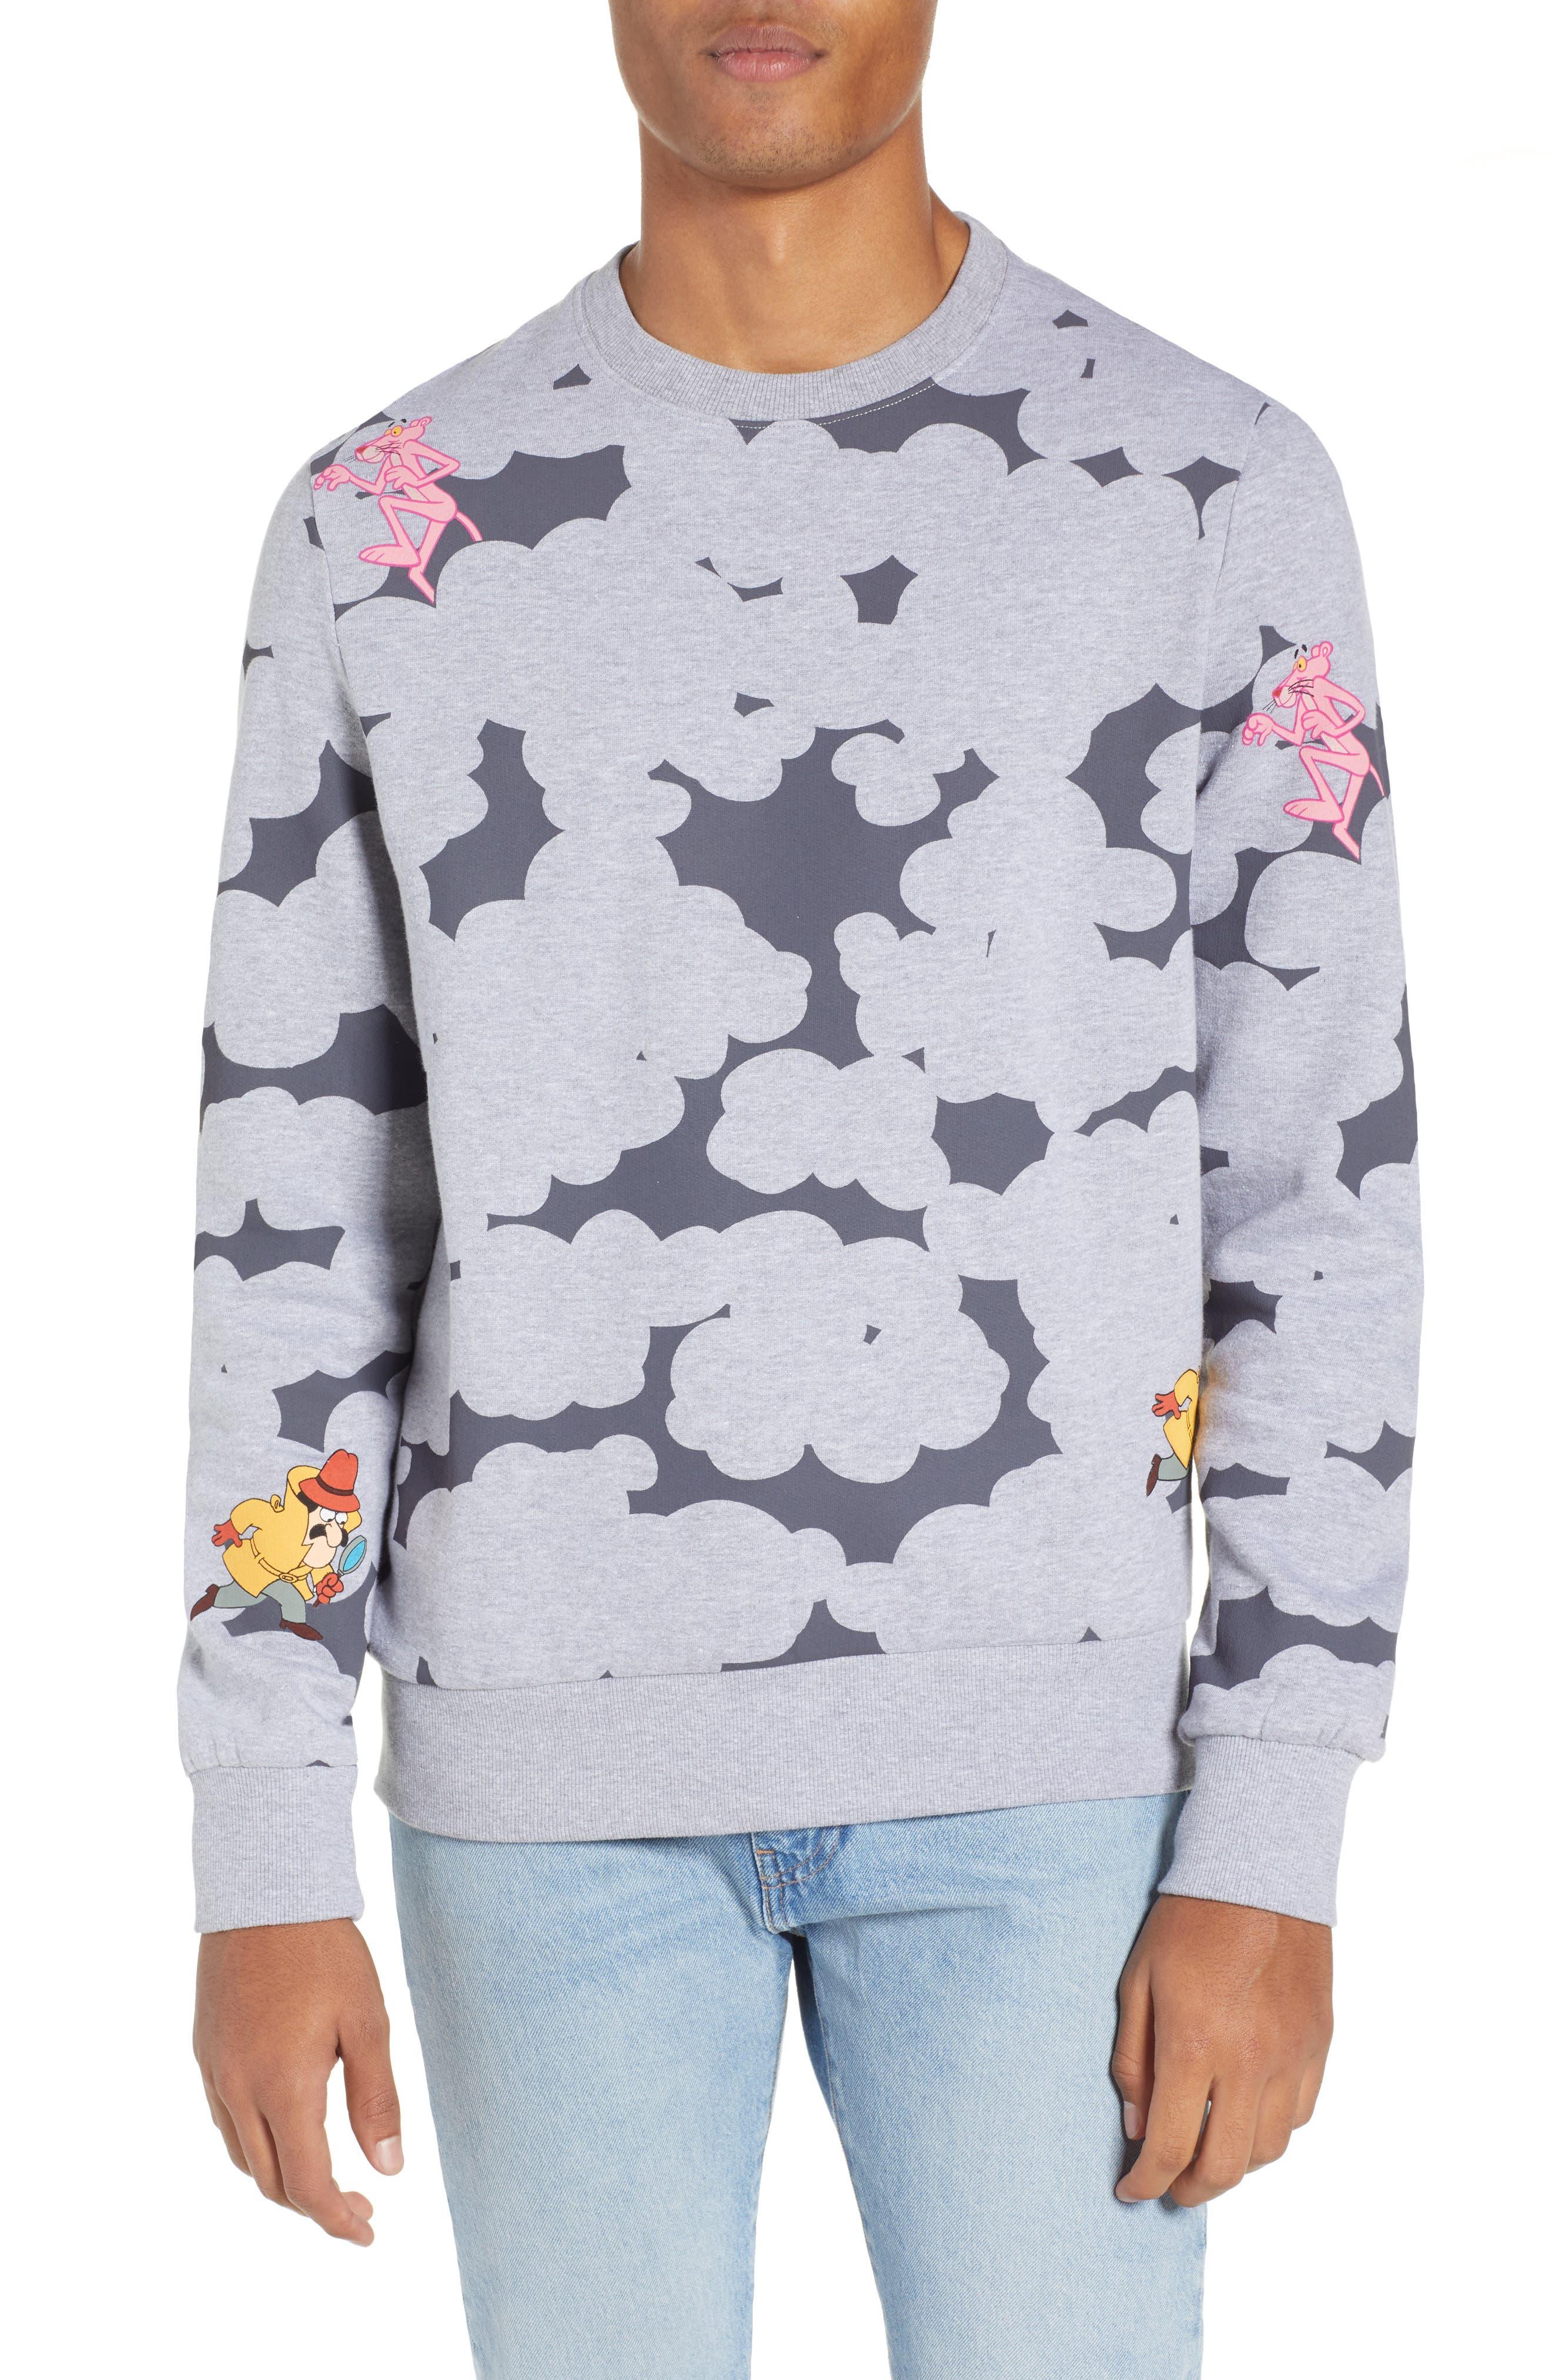 ELEVENPARIS Pink Panther Camo Sweatshirt in Black